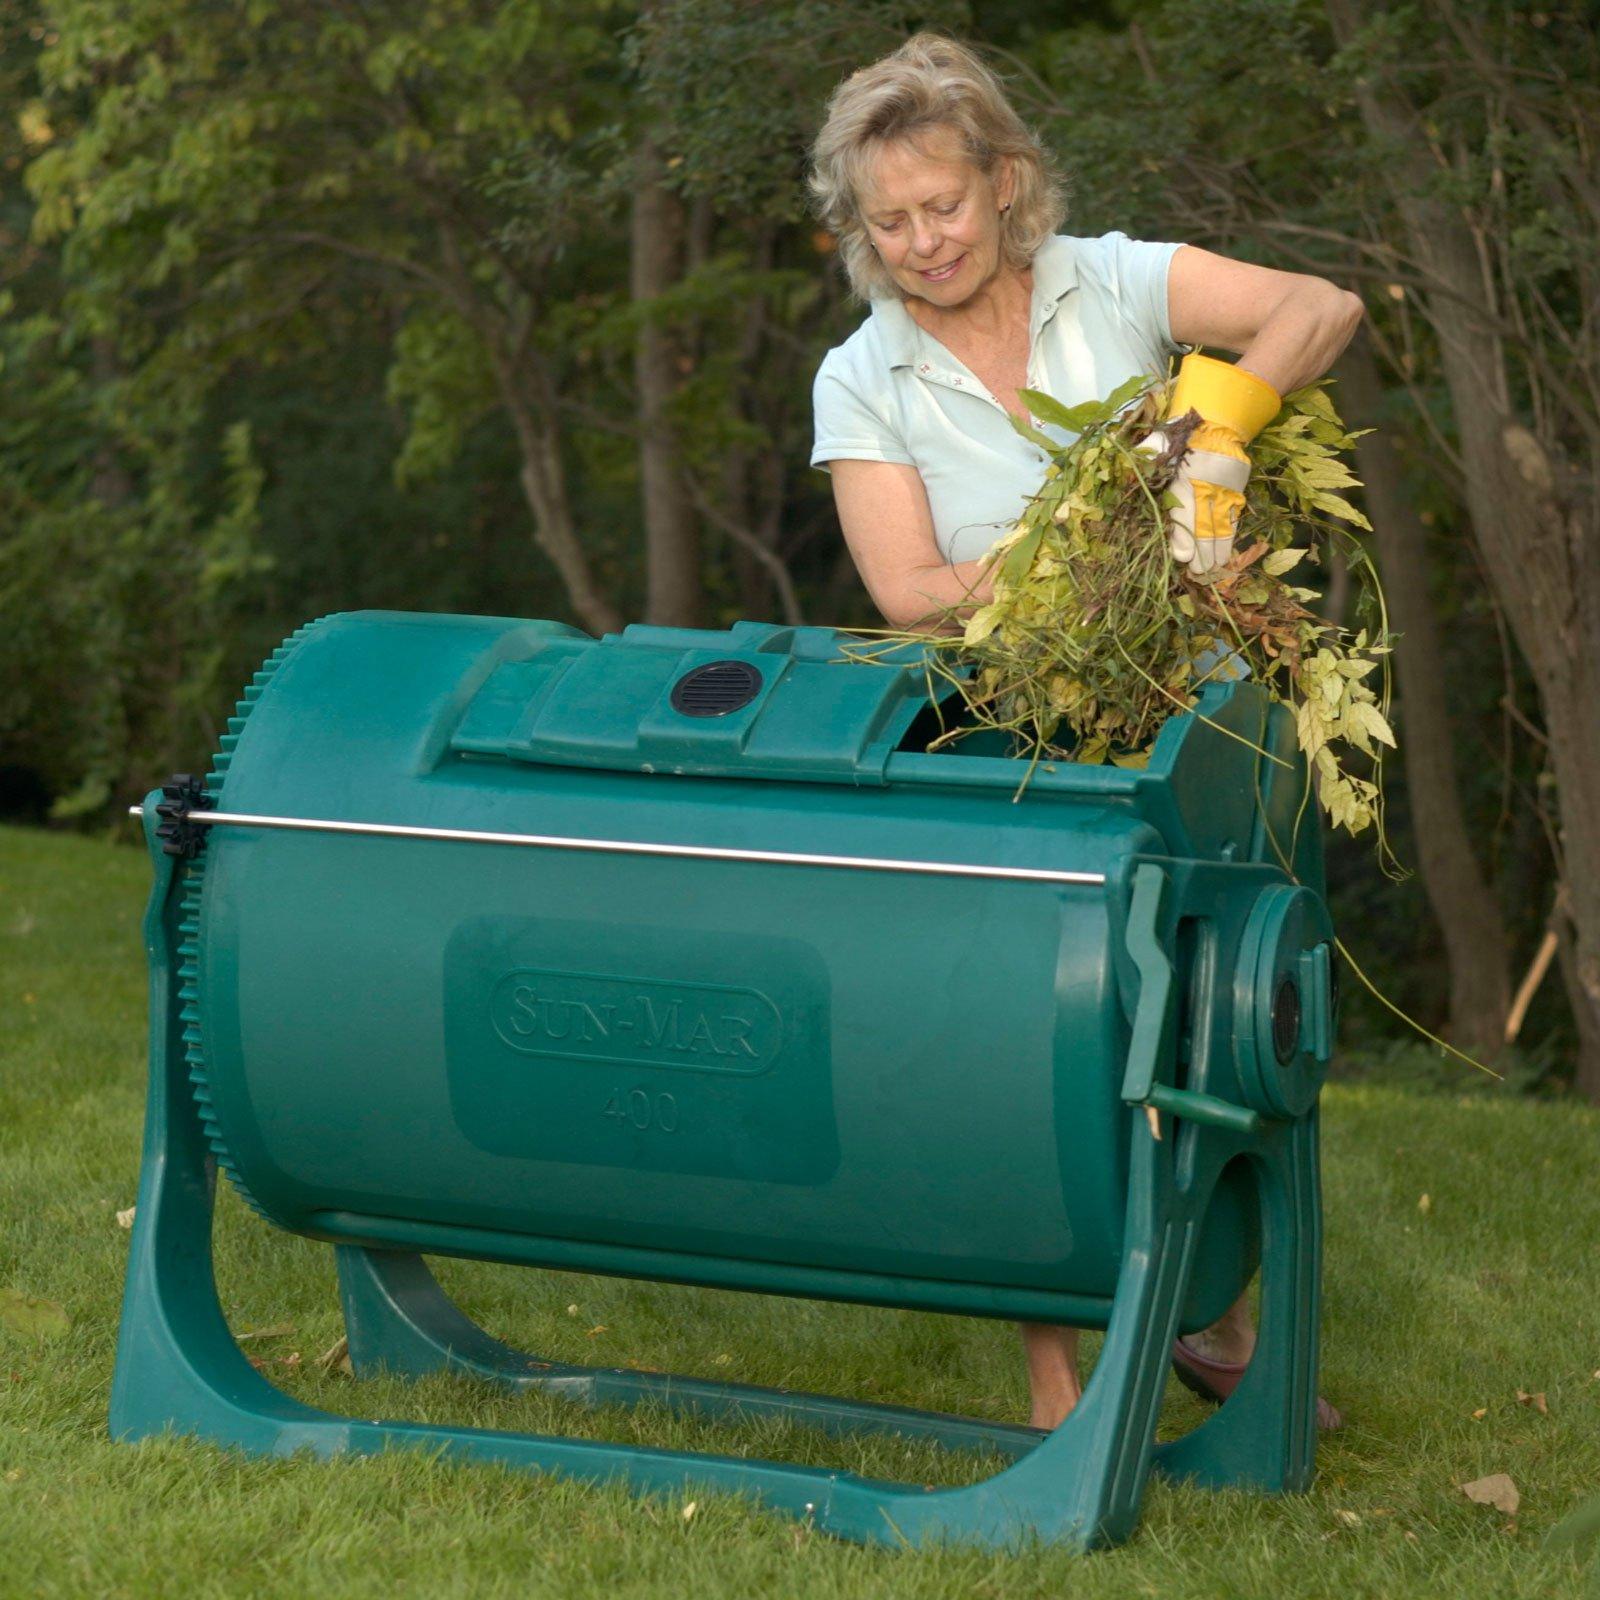 Sun-Mar 400 Autoflow 102 Gallon Compost Tumbler